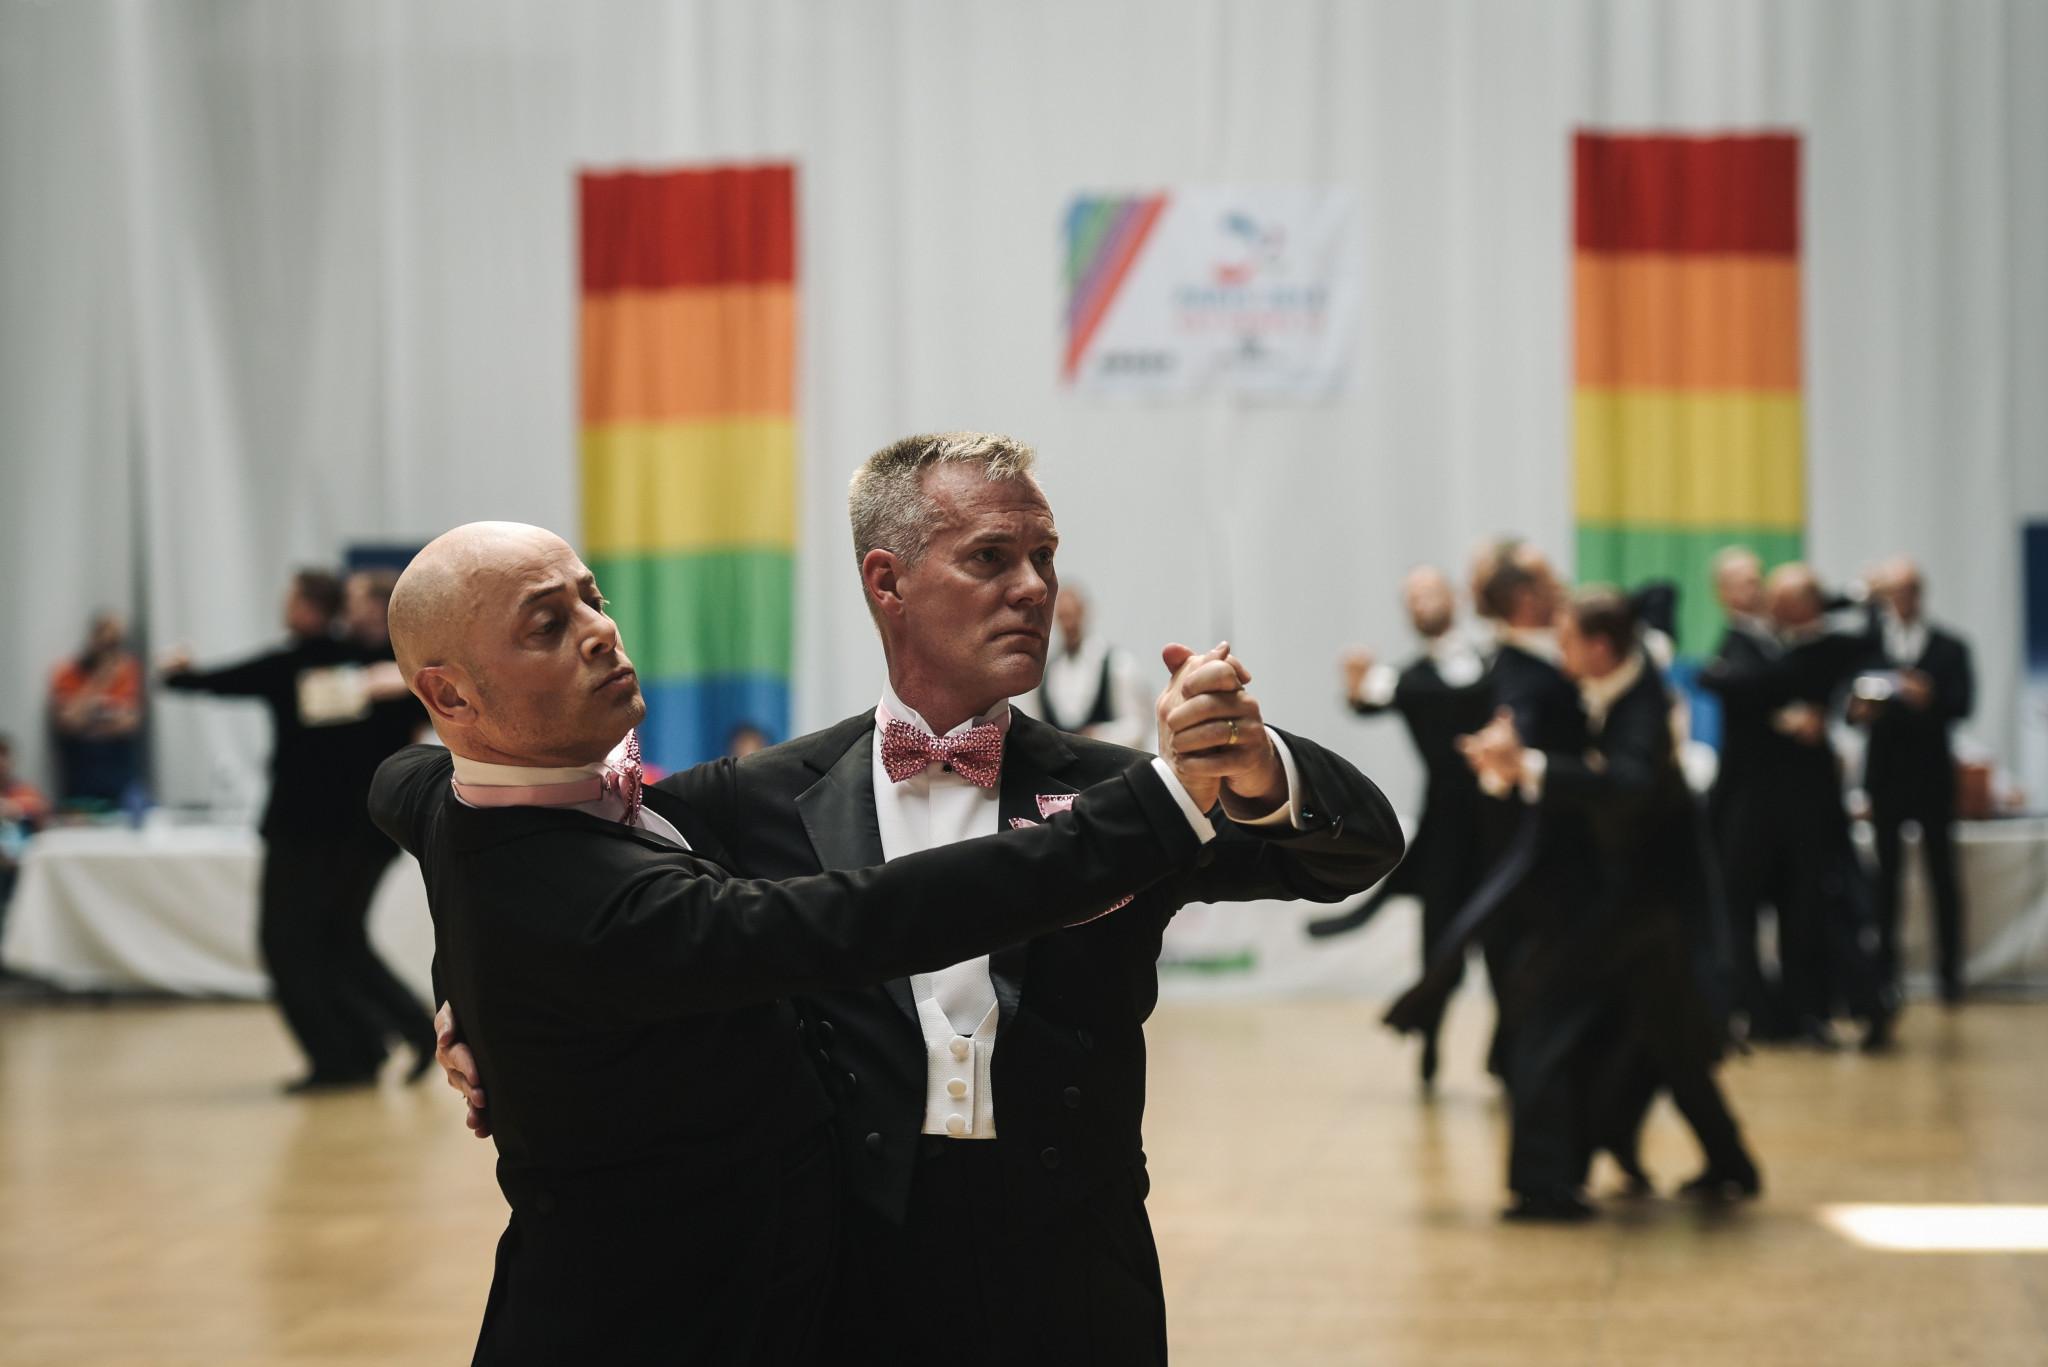 Guadalajara, Munich and Valencia shortlisted to host 2026 Gay Games